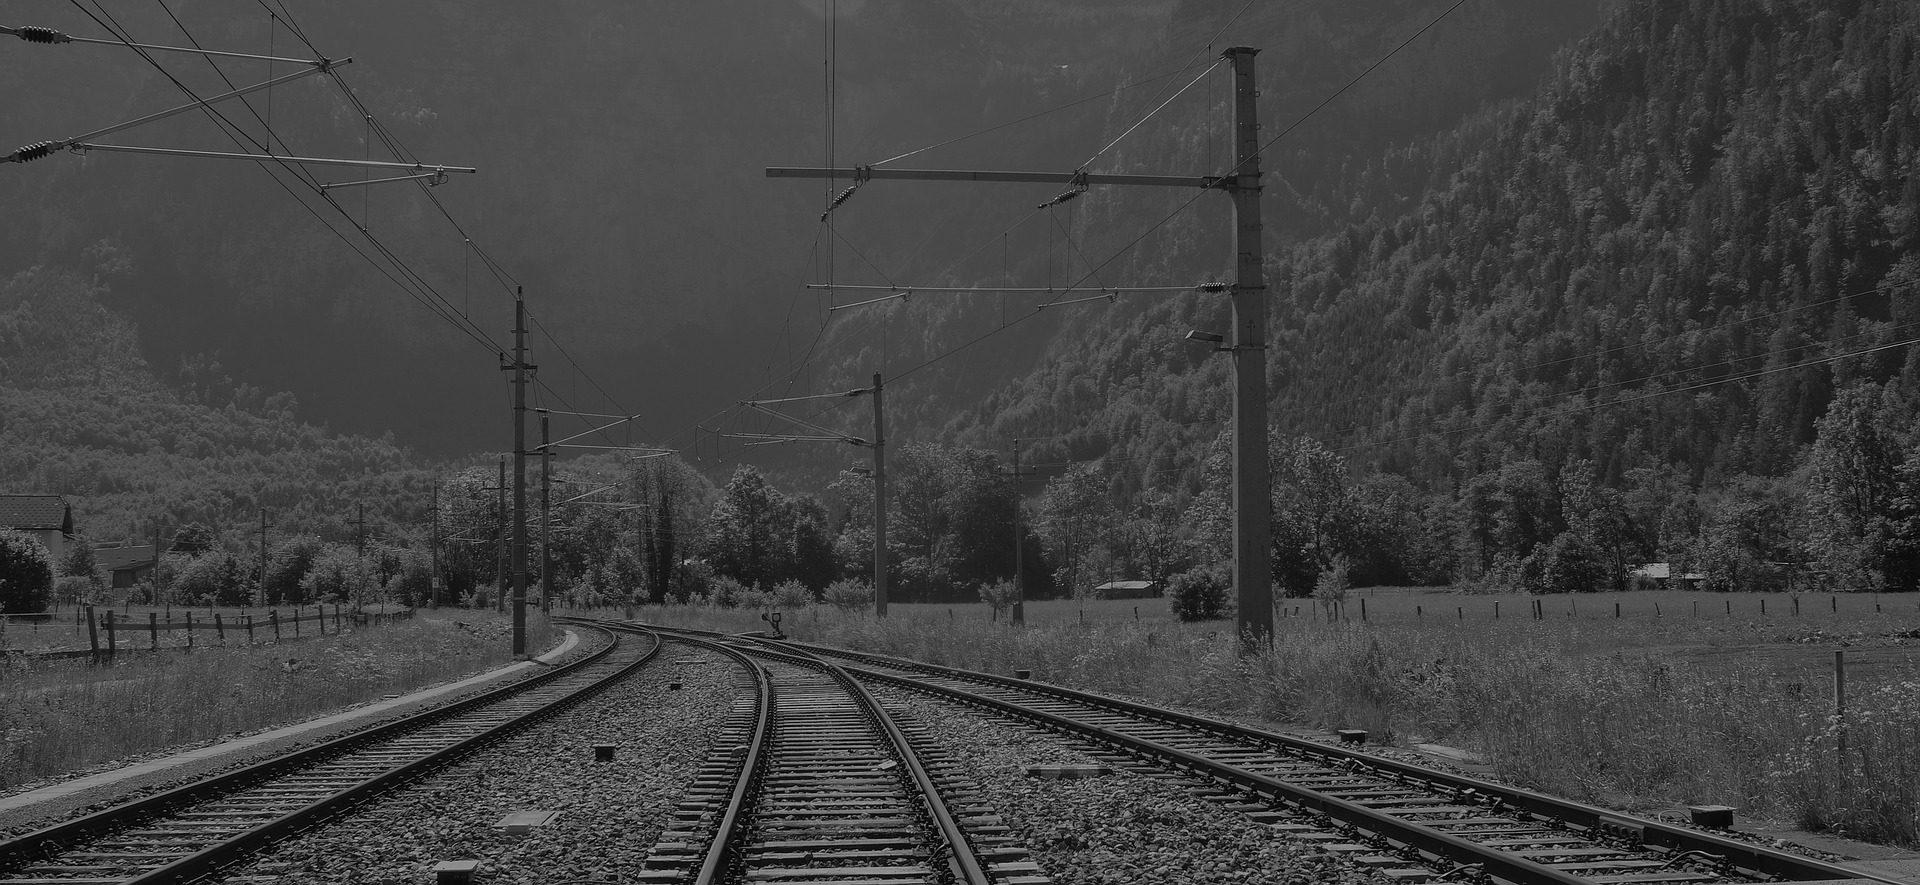 vías, 火车, 铁路, 树木, 字段, 在黑色和白色 - 高清壁纸 - 教授-falken.com